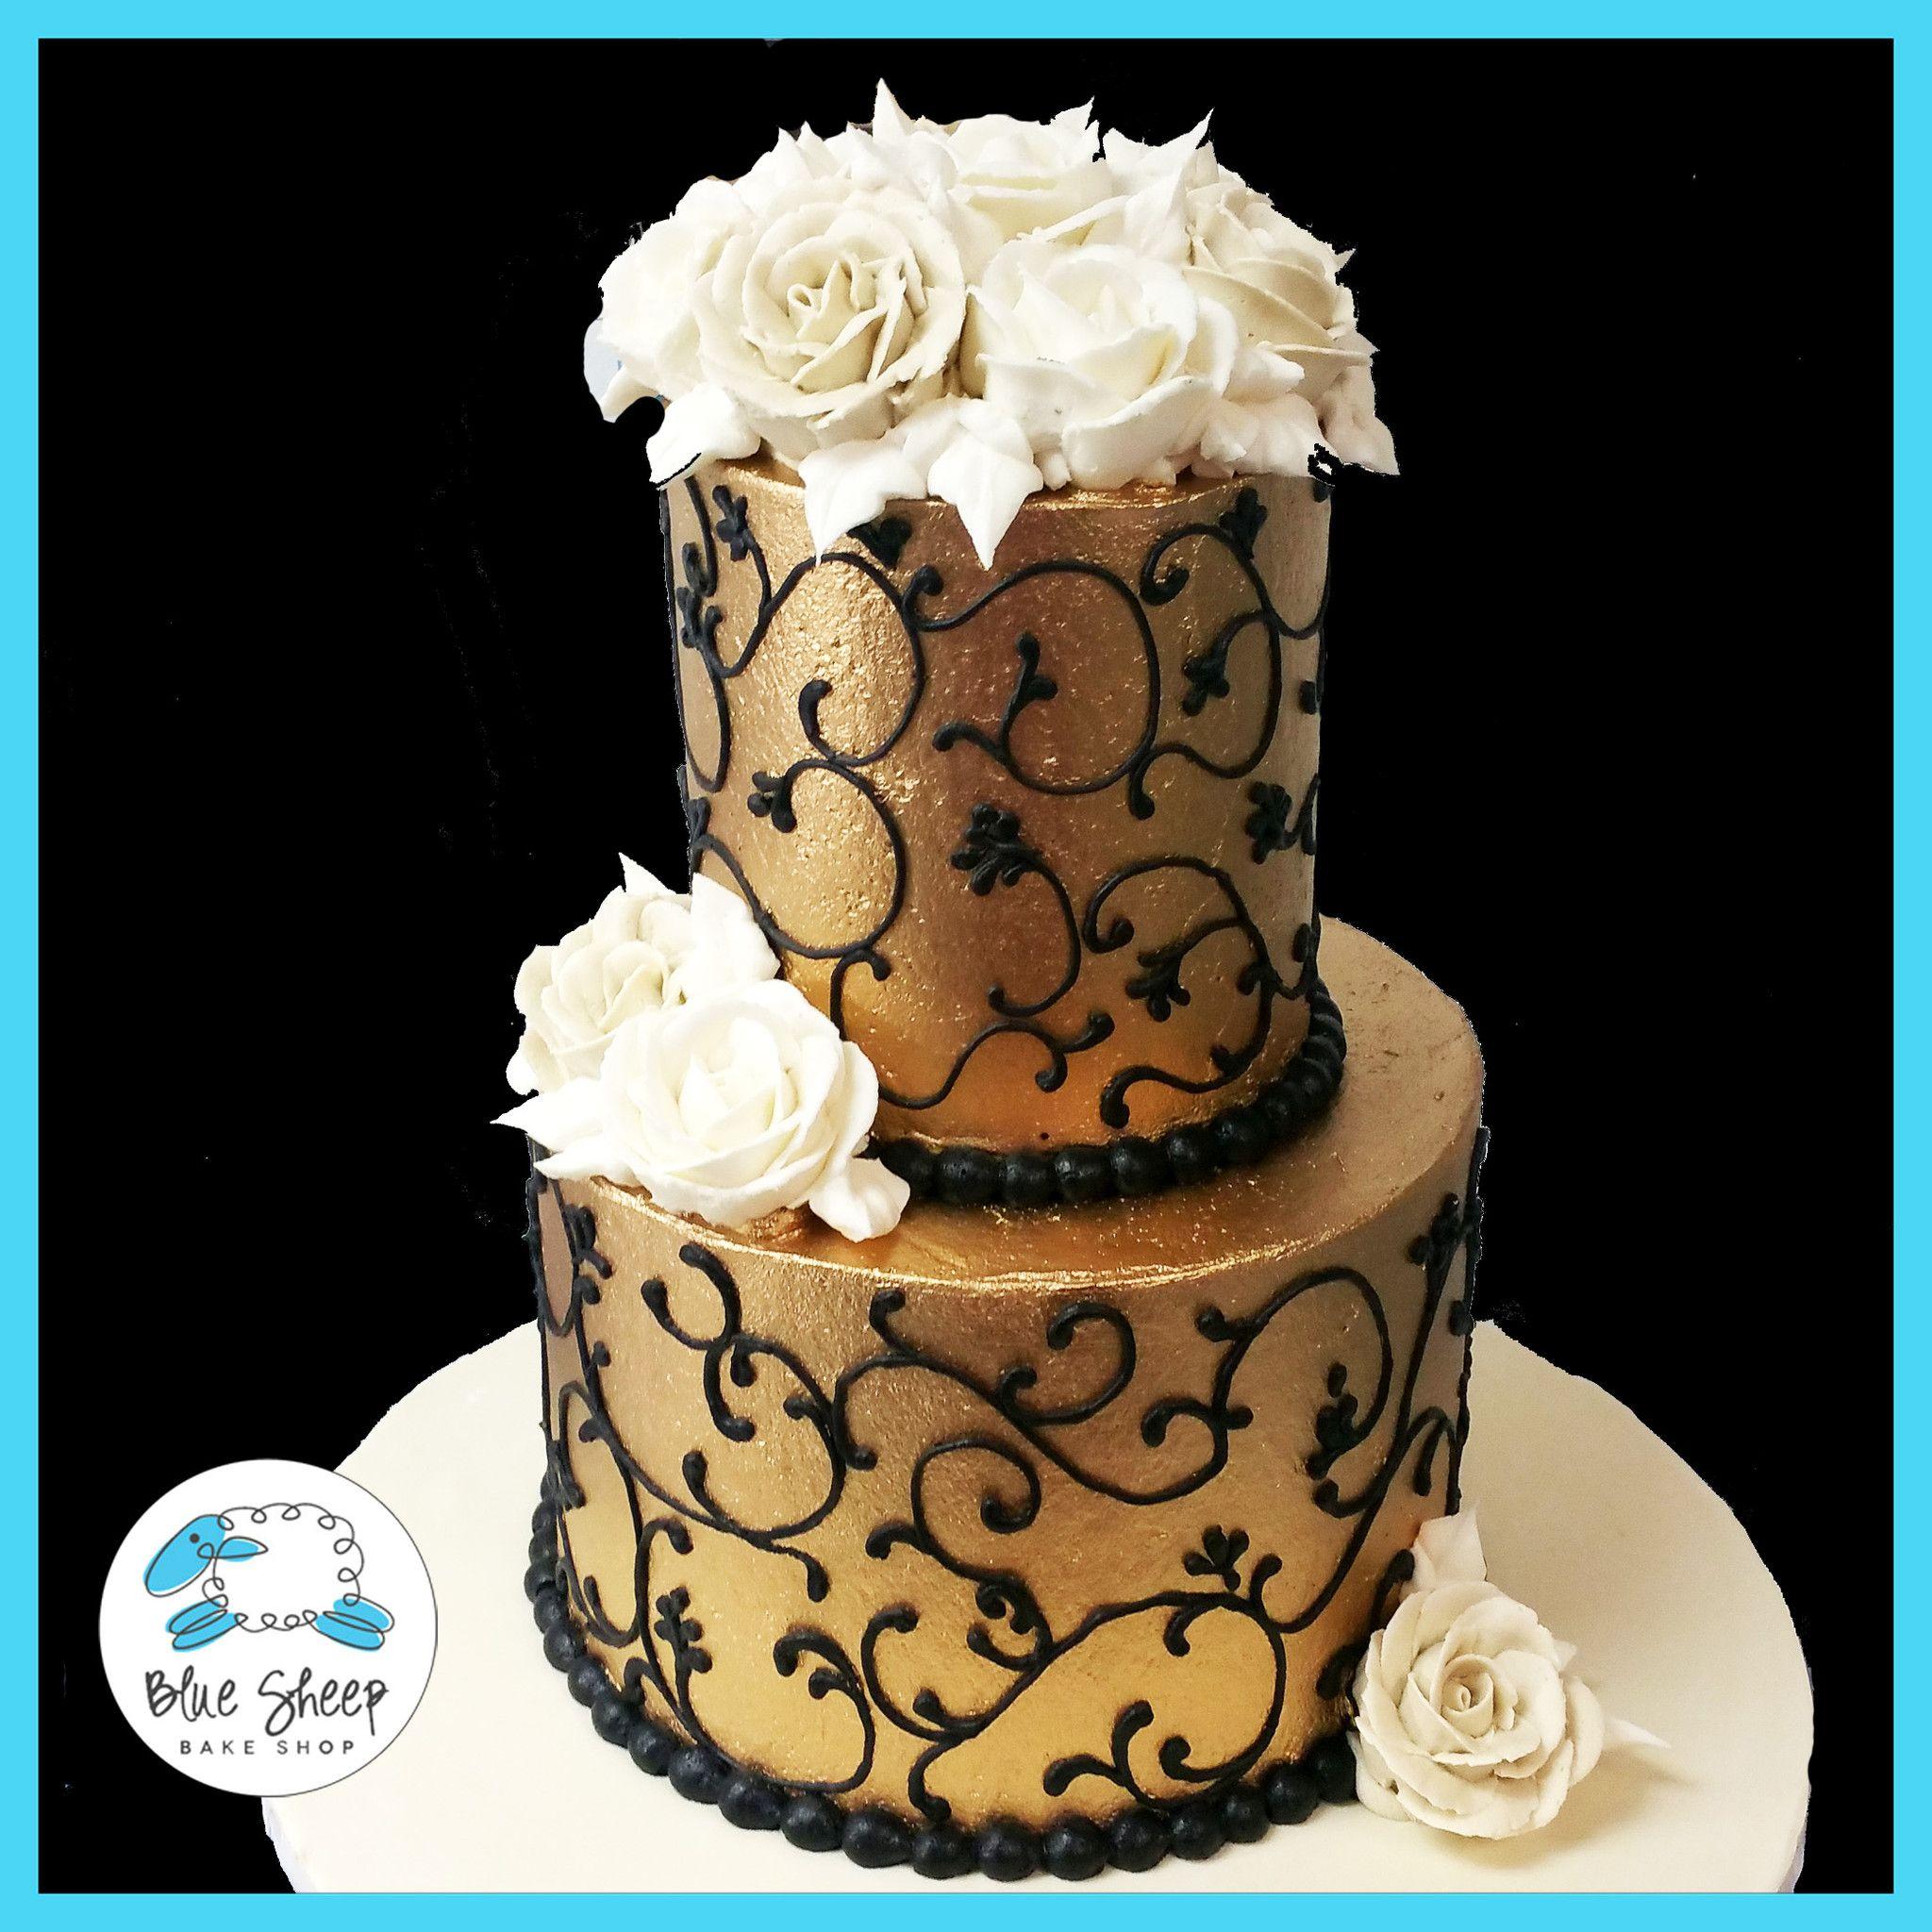 Gold and Black Buttercream Birthday cake Blue Sheep Bake Shop